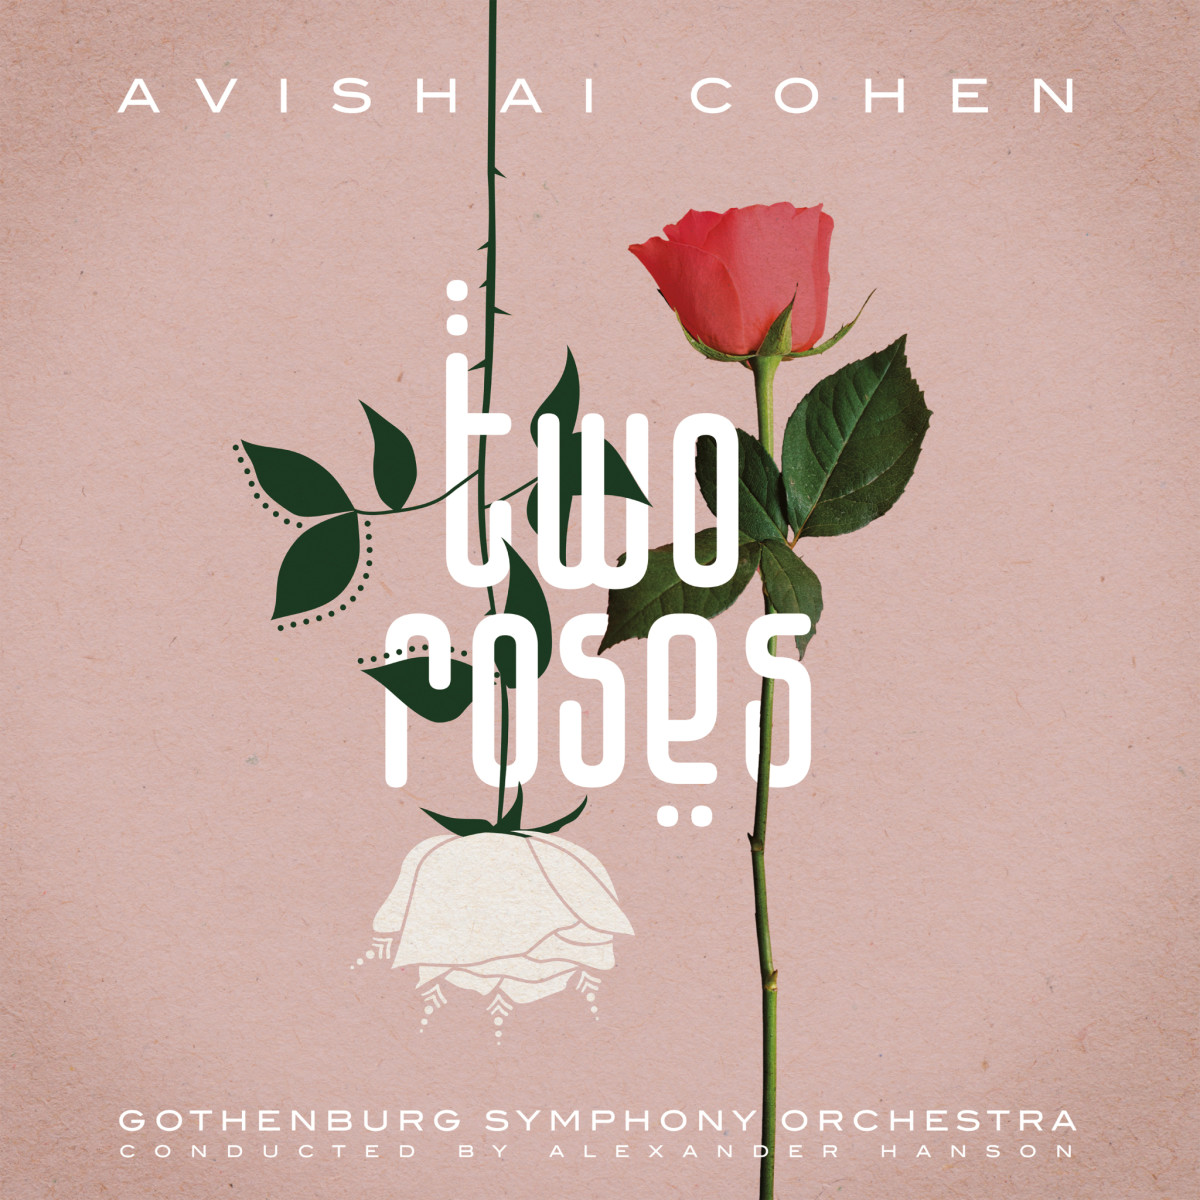 avishaicohen-tworoses_cover